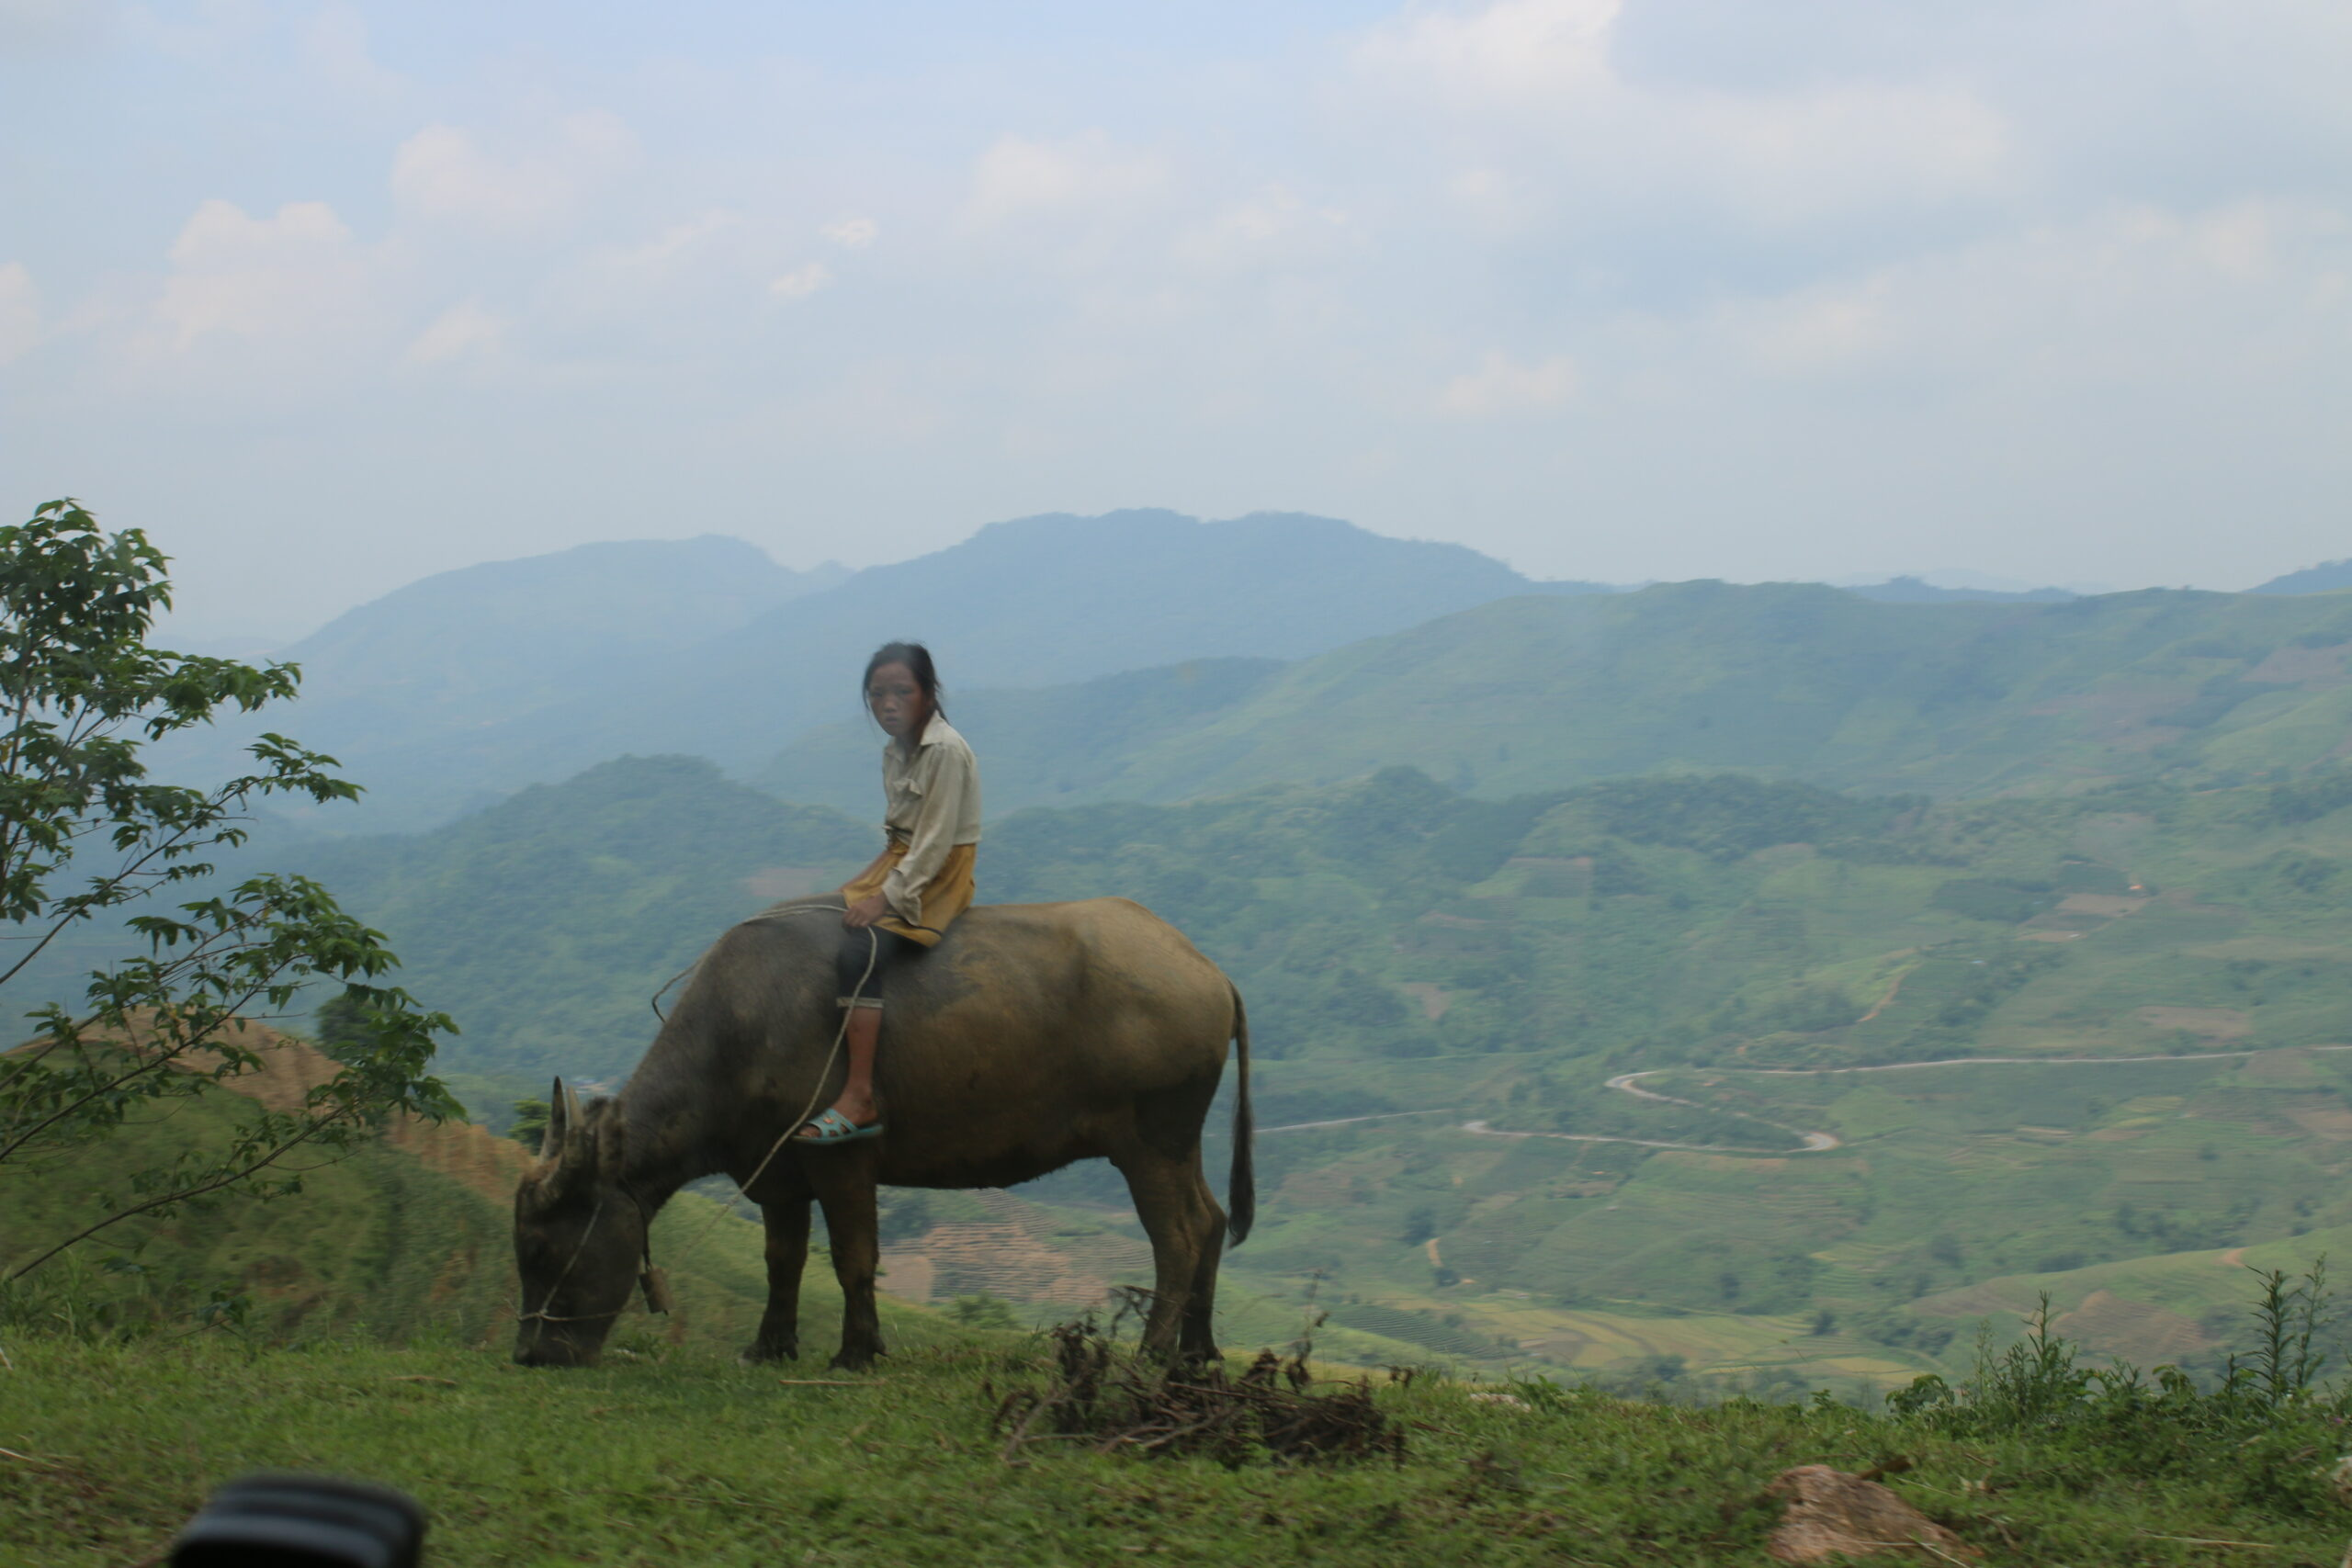 cao-son child on buffalo